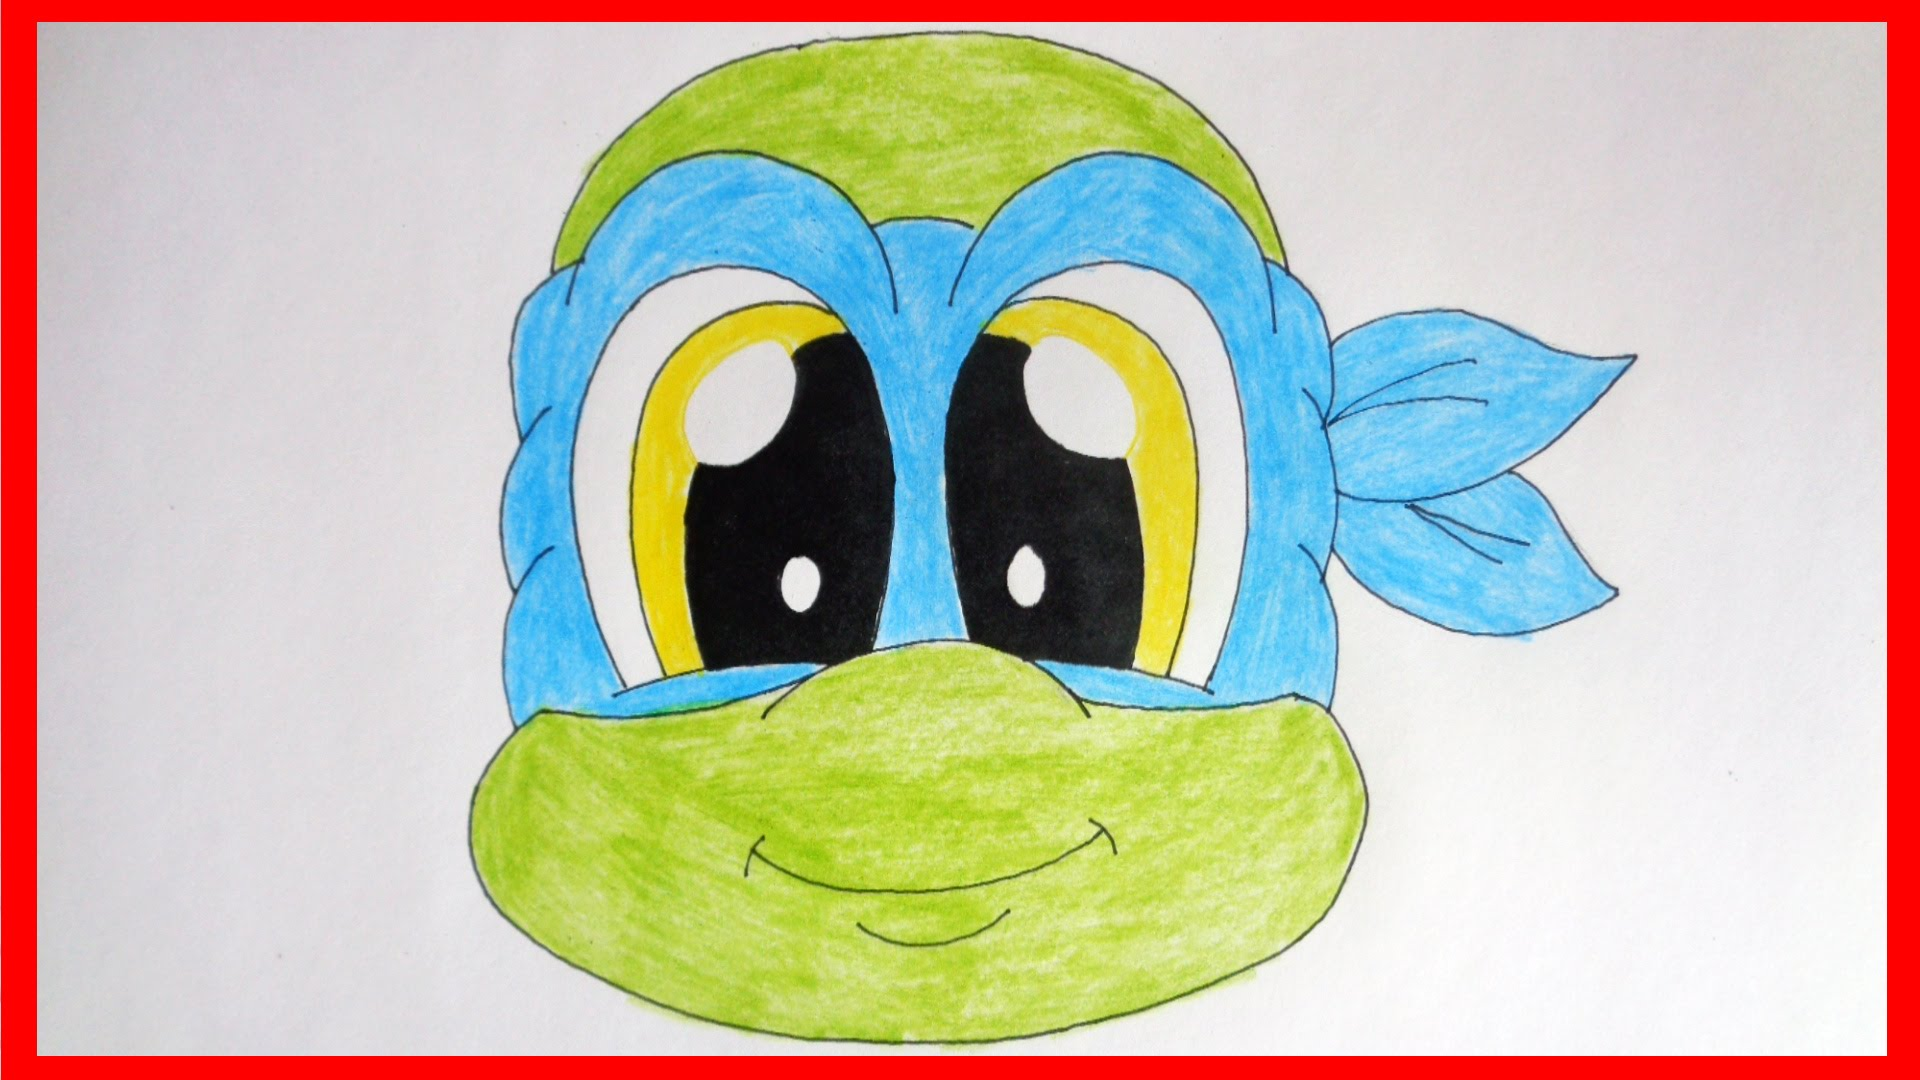 1920x1080 How To Draw Cute Ninja Turtles, Leonardo